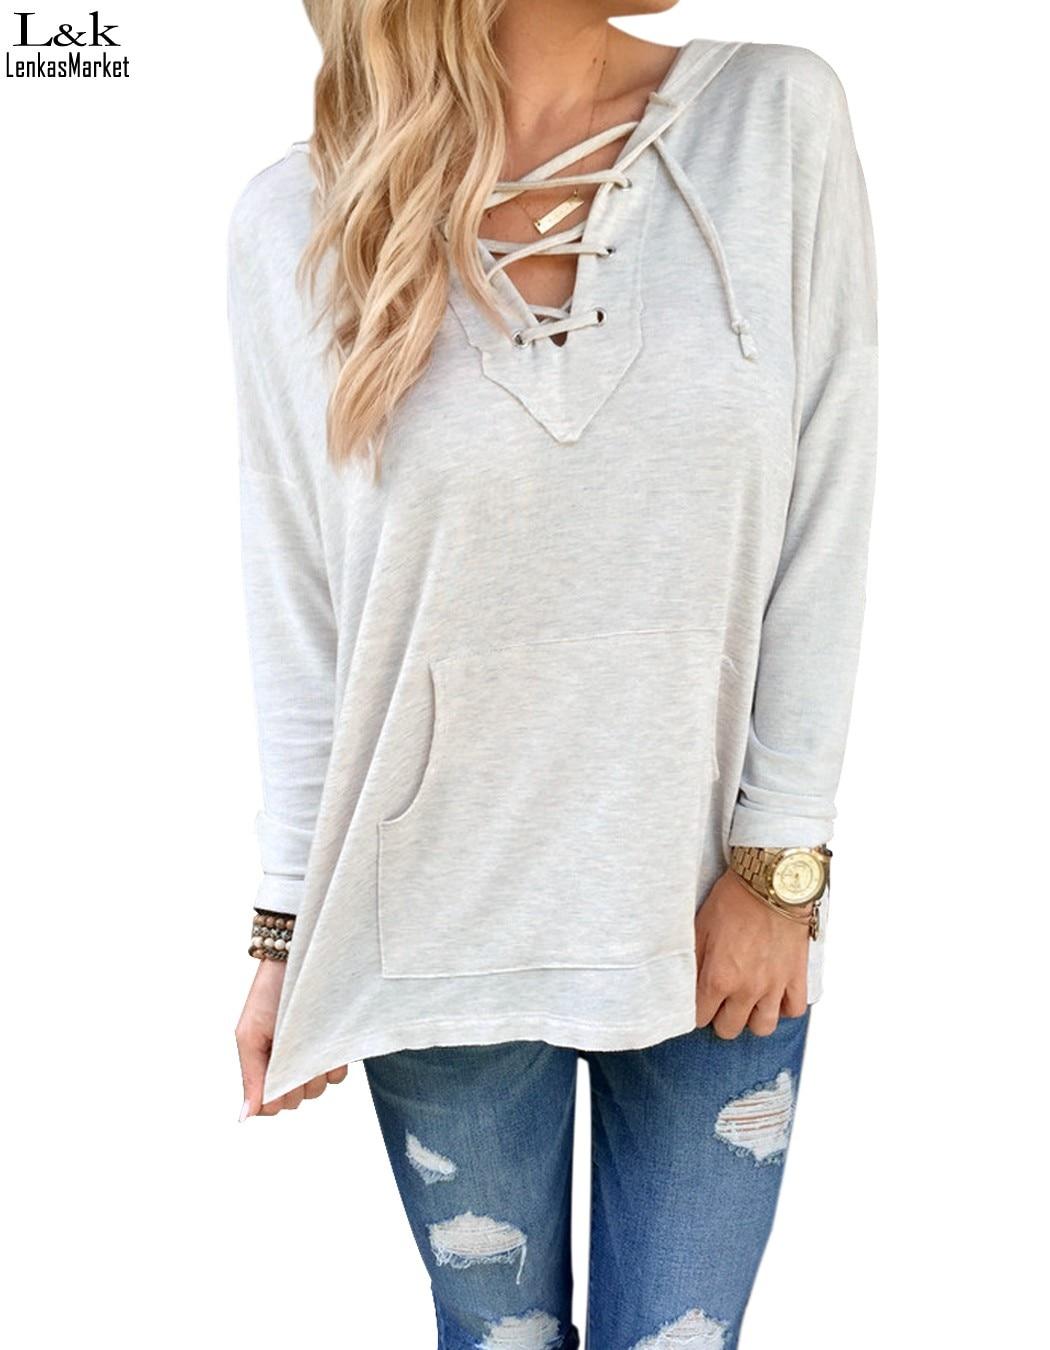 Women'S White Hoodie Sweatshirt - Hardon Clothes